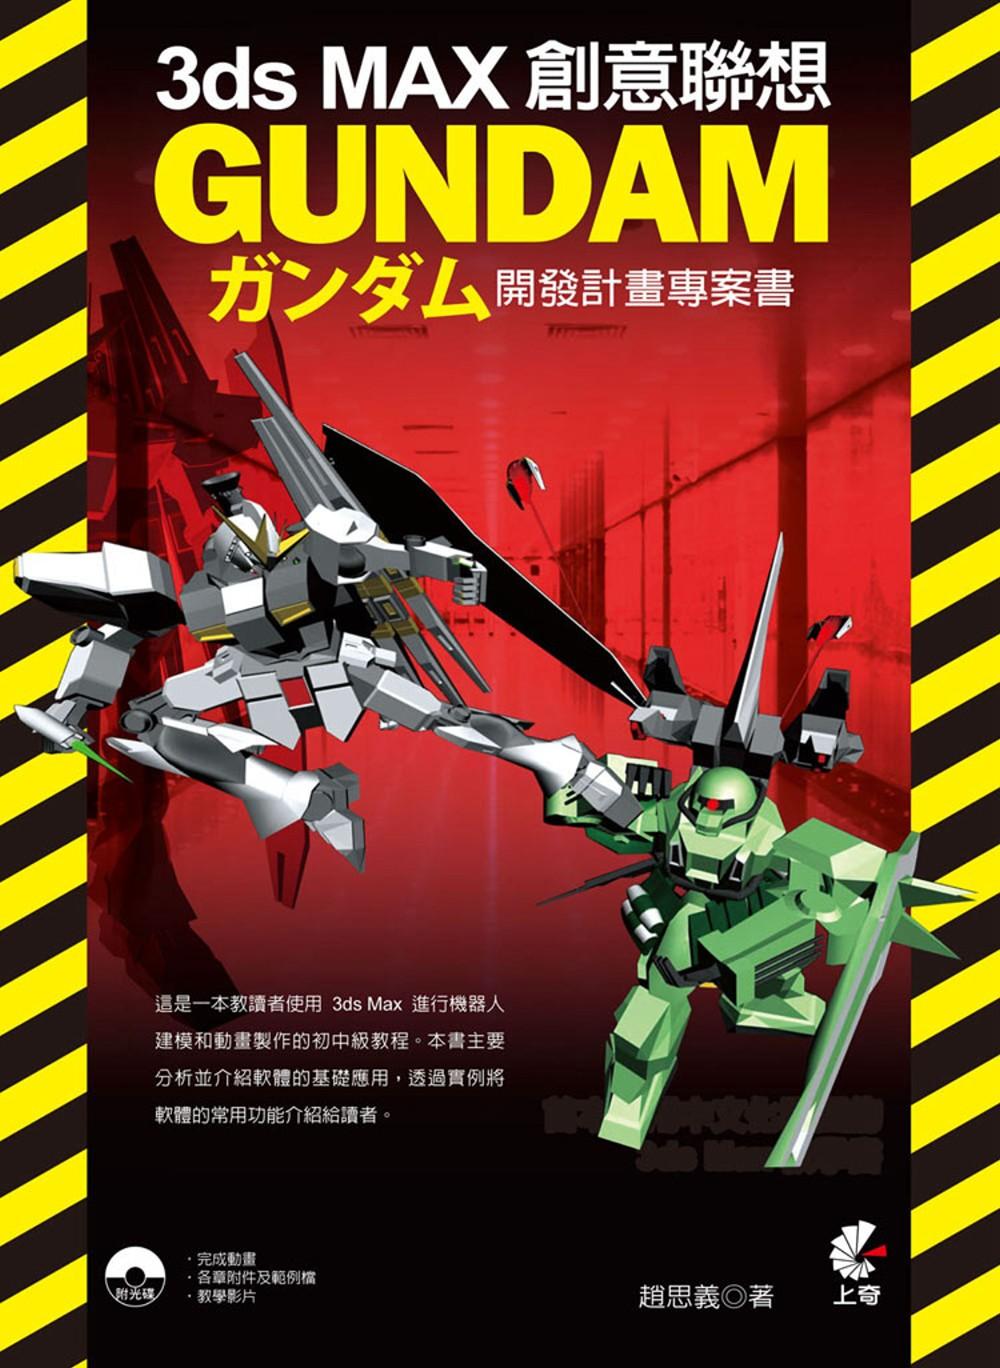 3ds Max創意聯想:GUNDAM開發計畫專案書